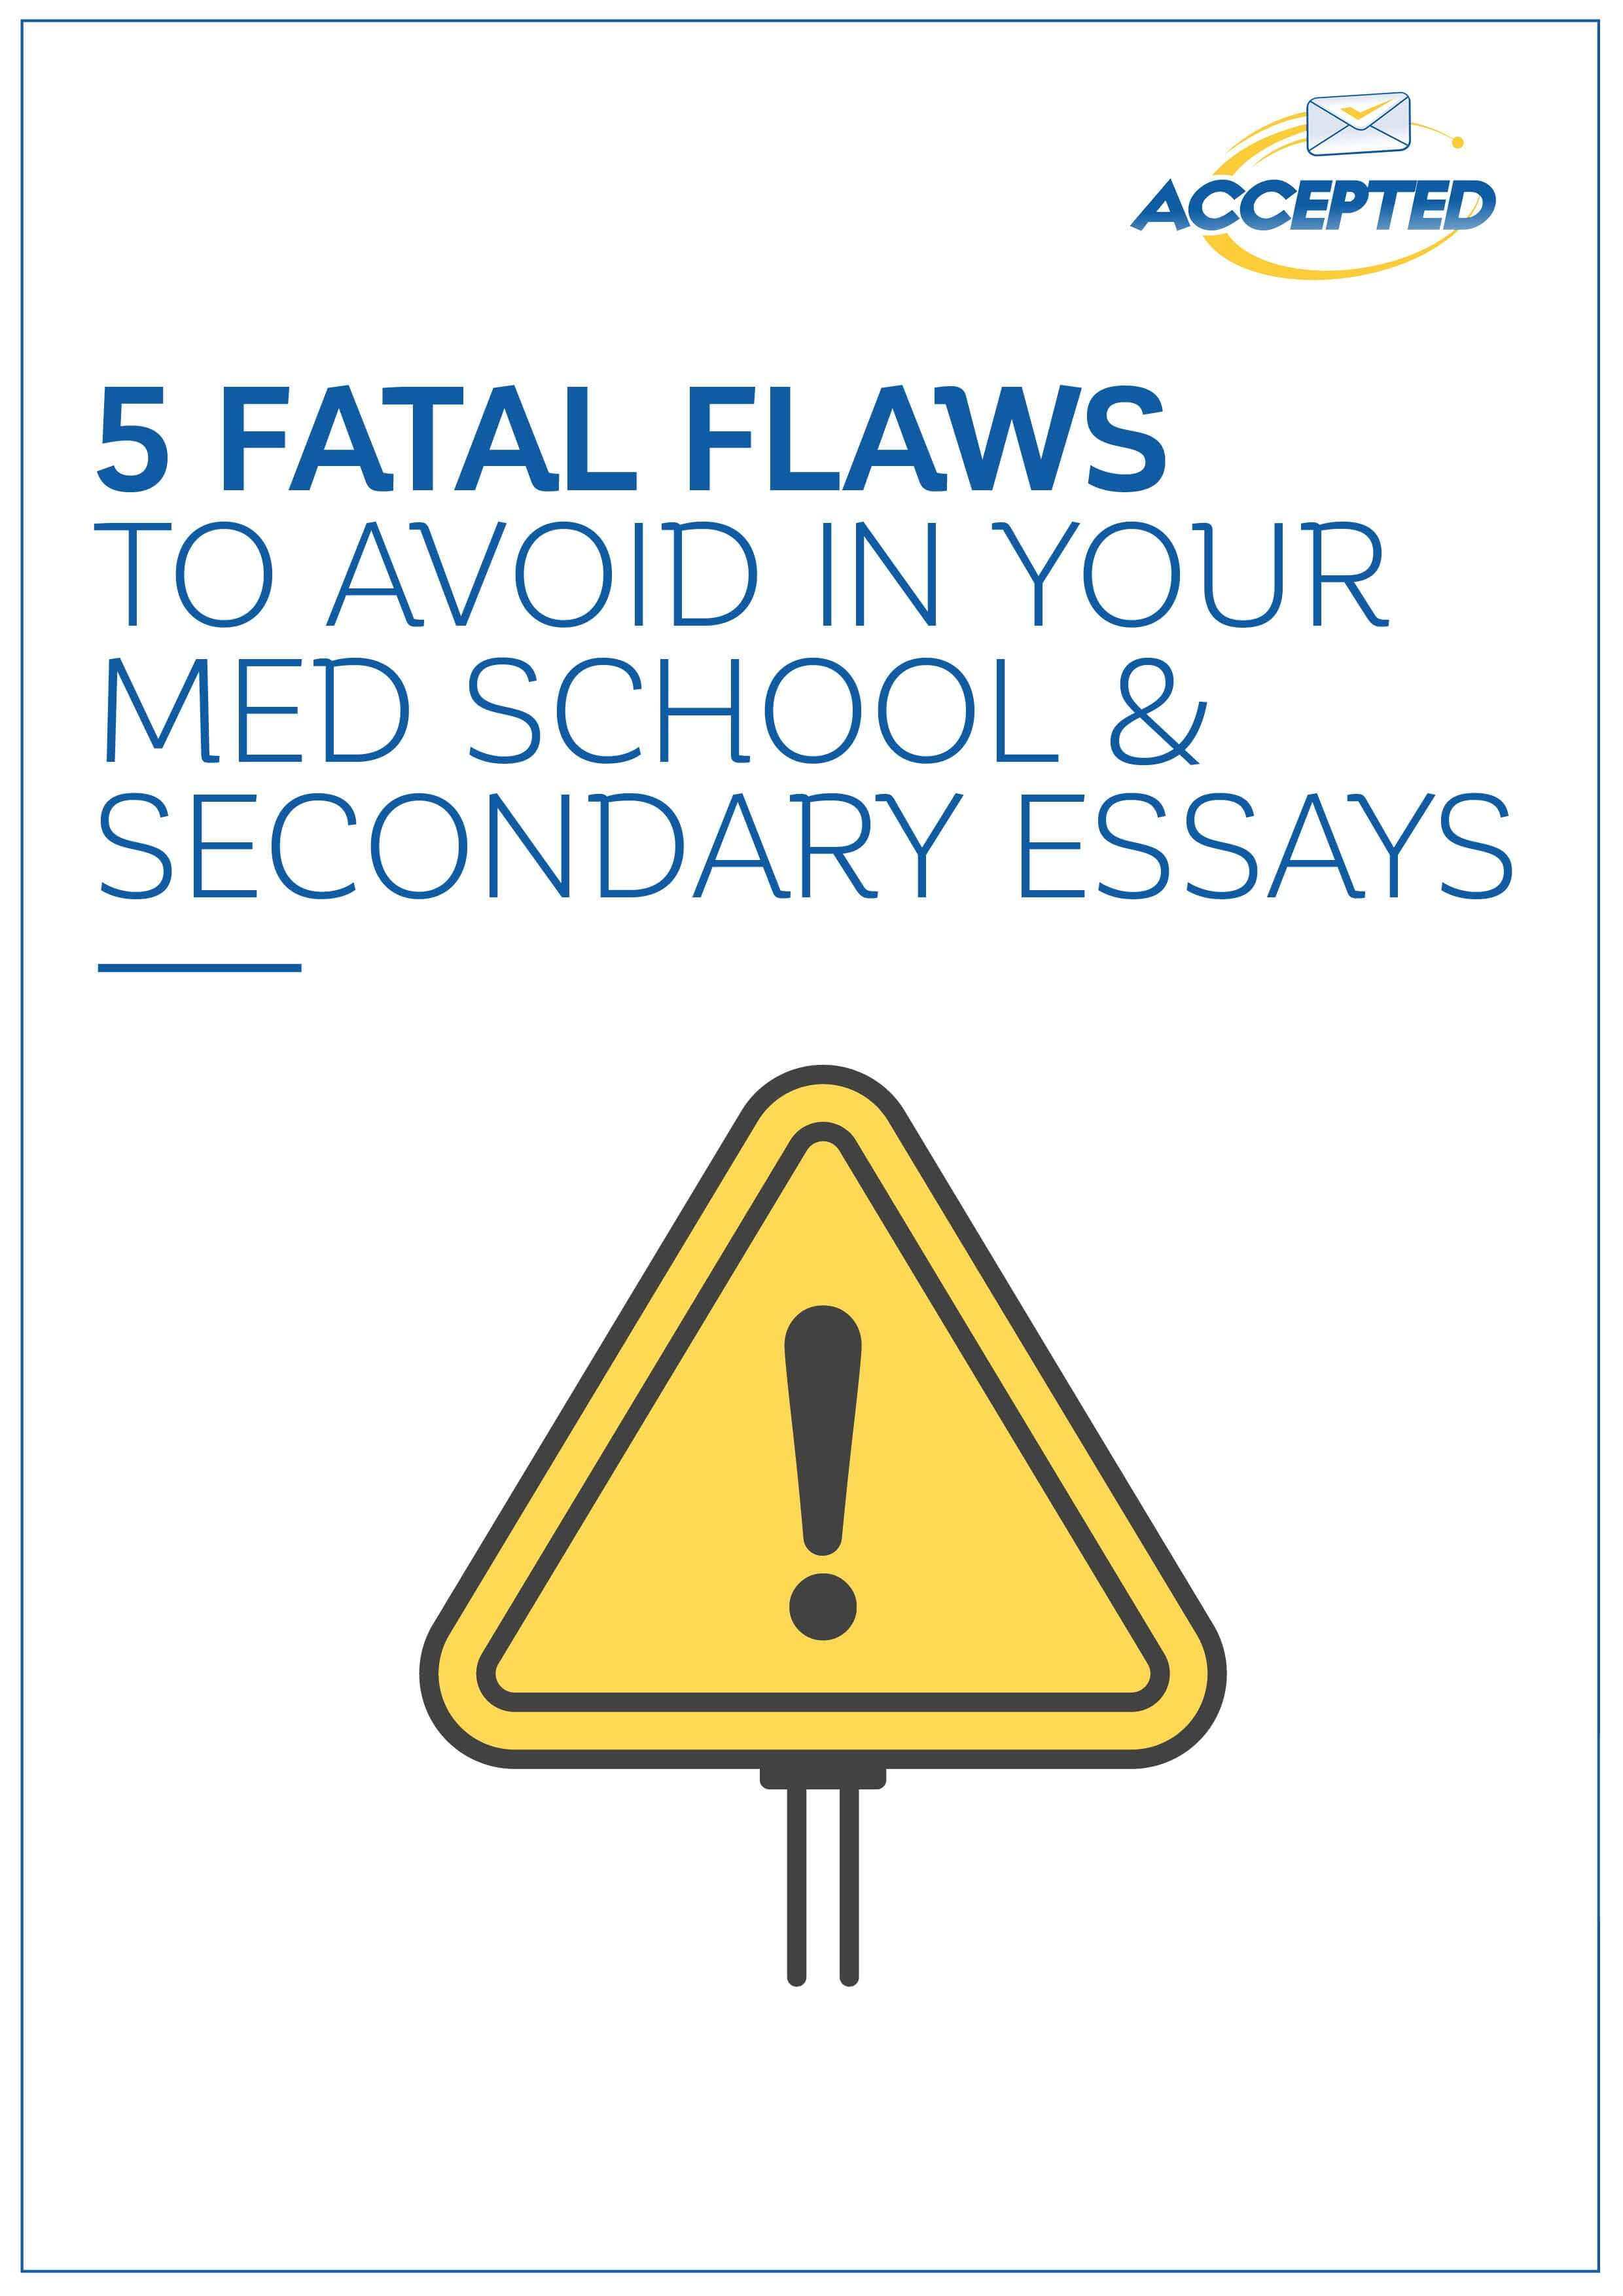 secondary essays for med school